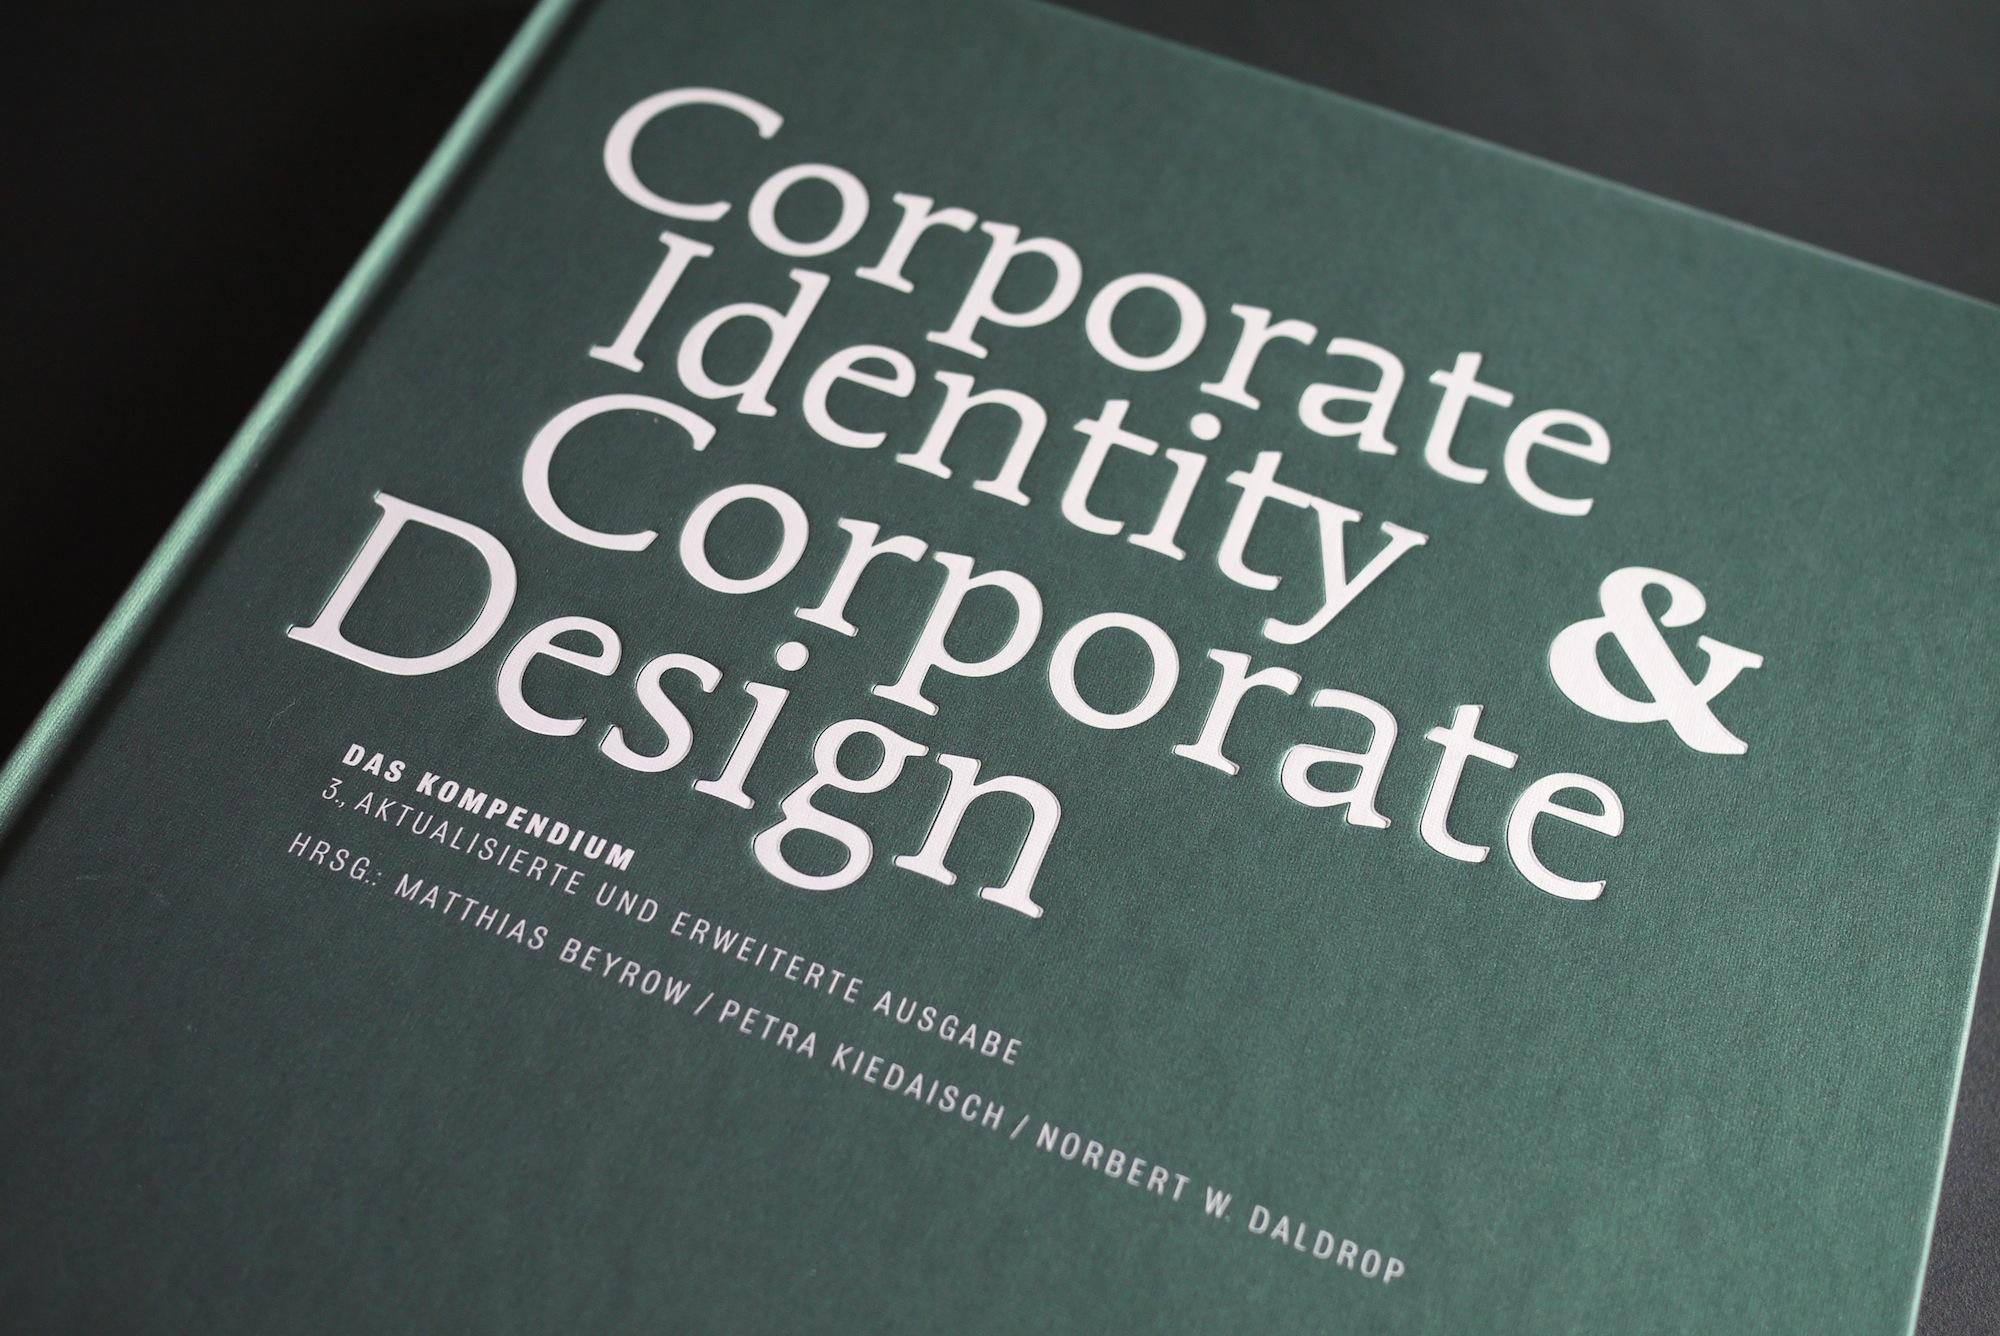 Corporate Identity & Service Design_1